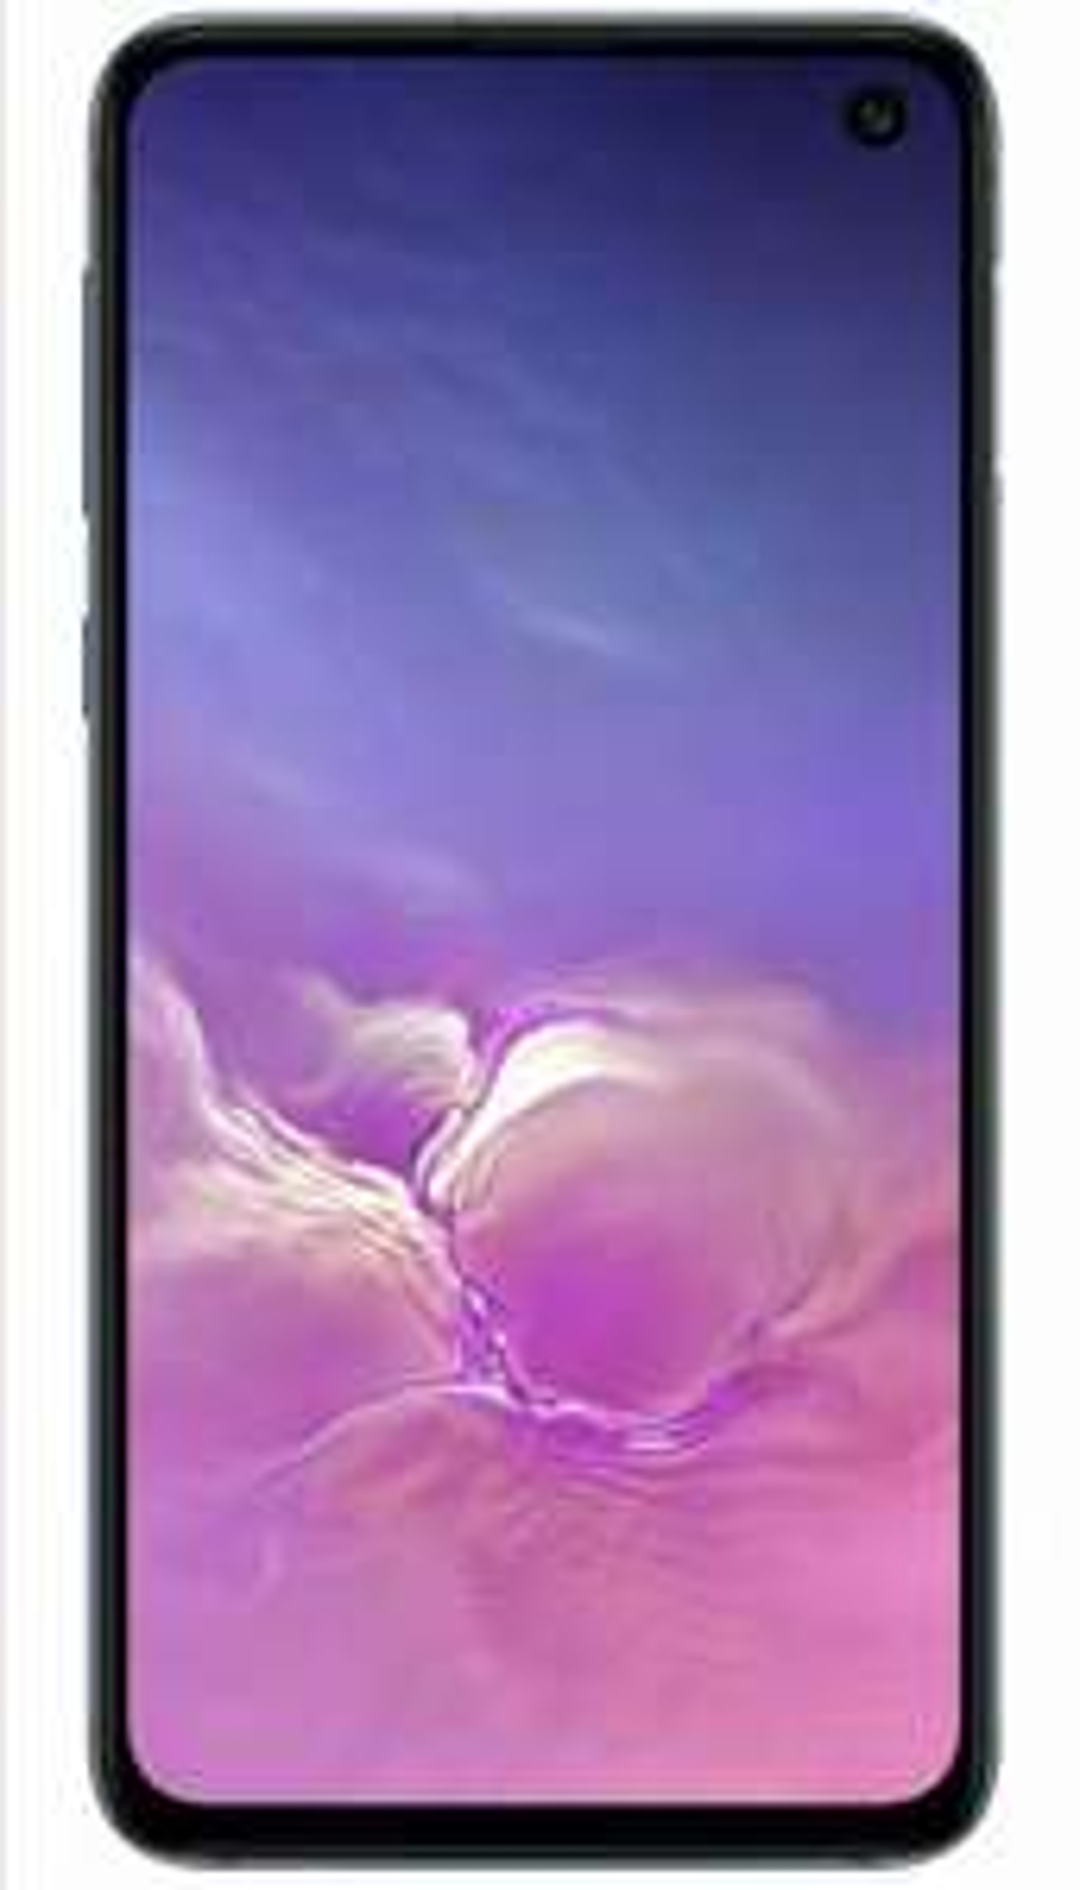 Samsung Galaxy S10e 128GB Smartphone Refurbished £363.99 @ Argos Ebay